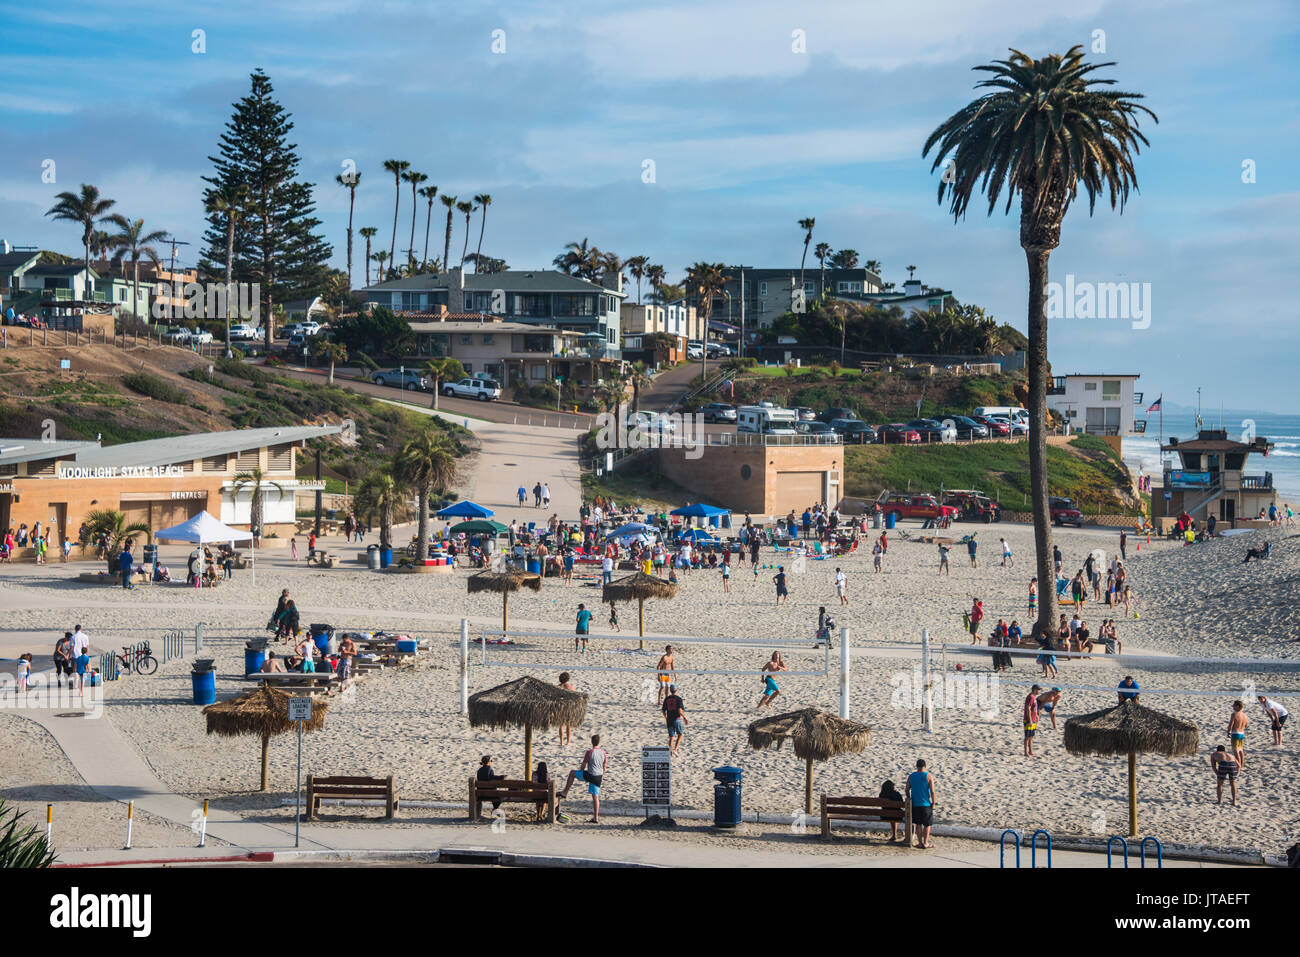 Beach of Encinitas, California, United States of America, North America - Stock Image